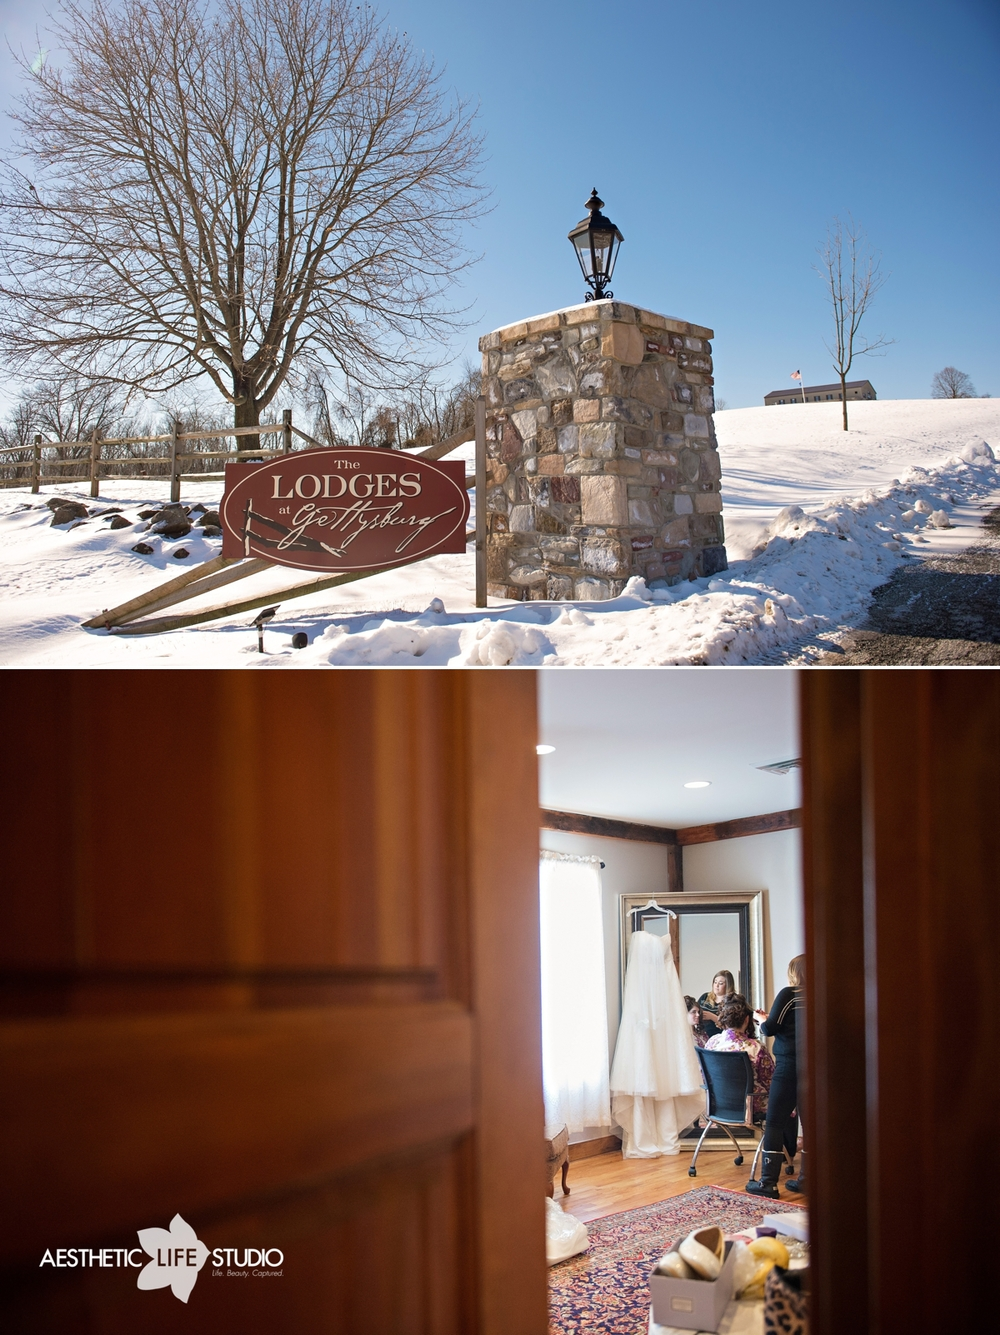 the_lodges_at_gettysburg_001.jpg